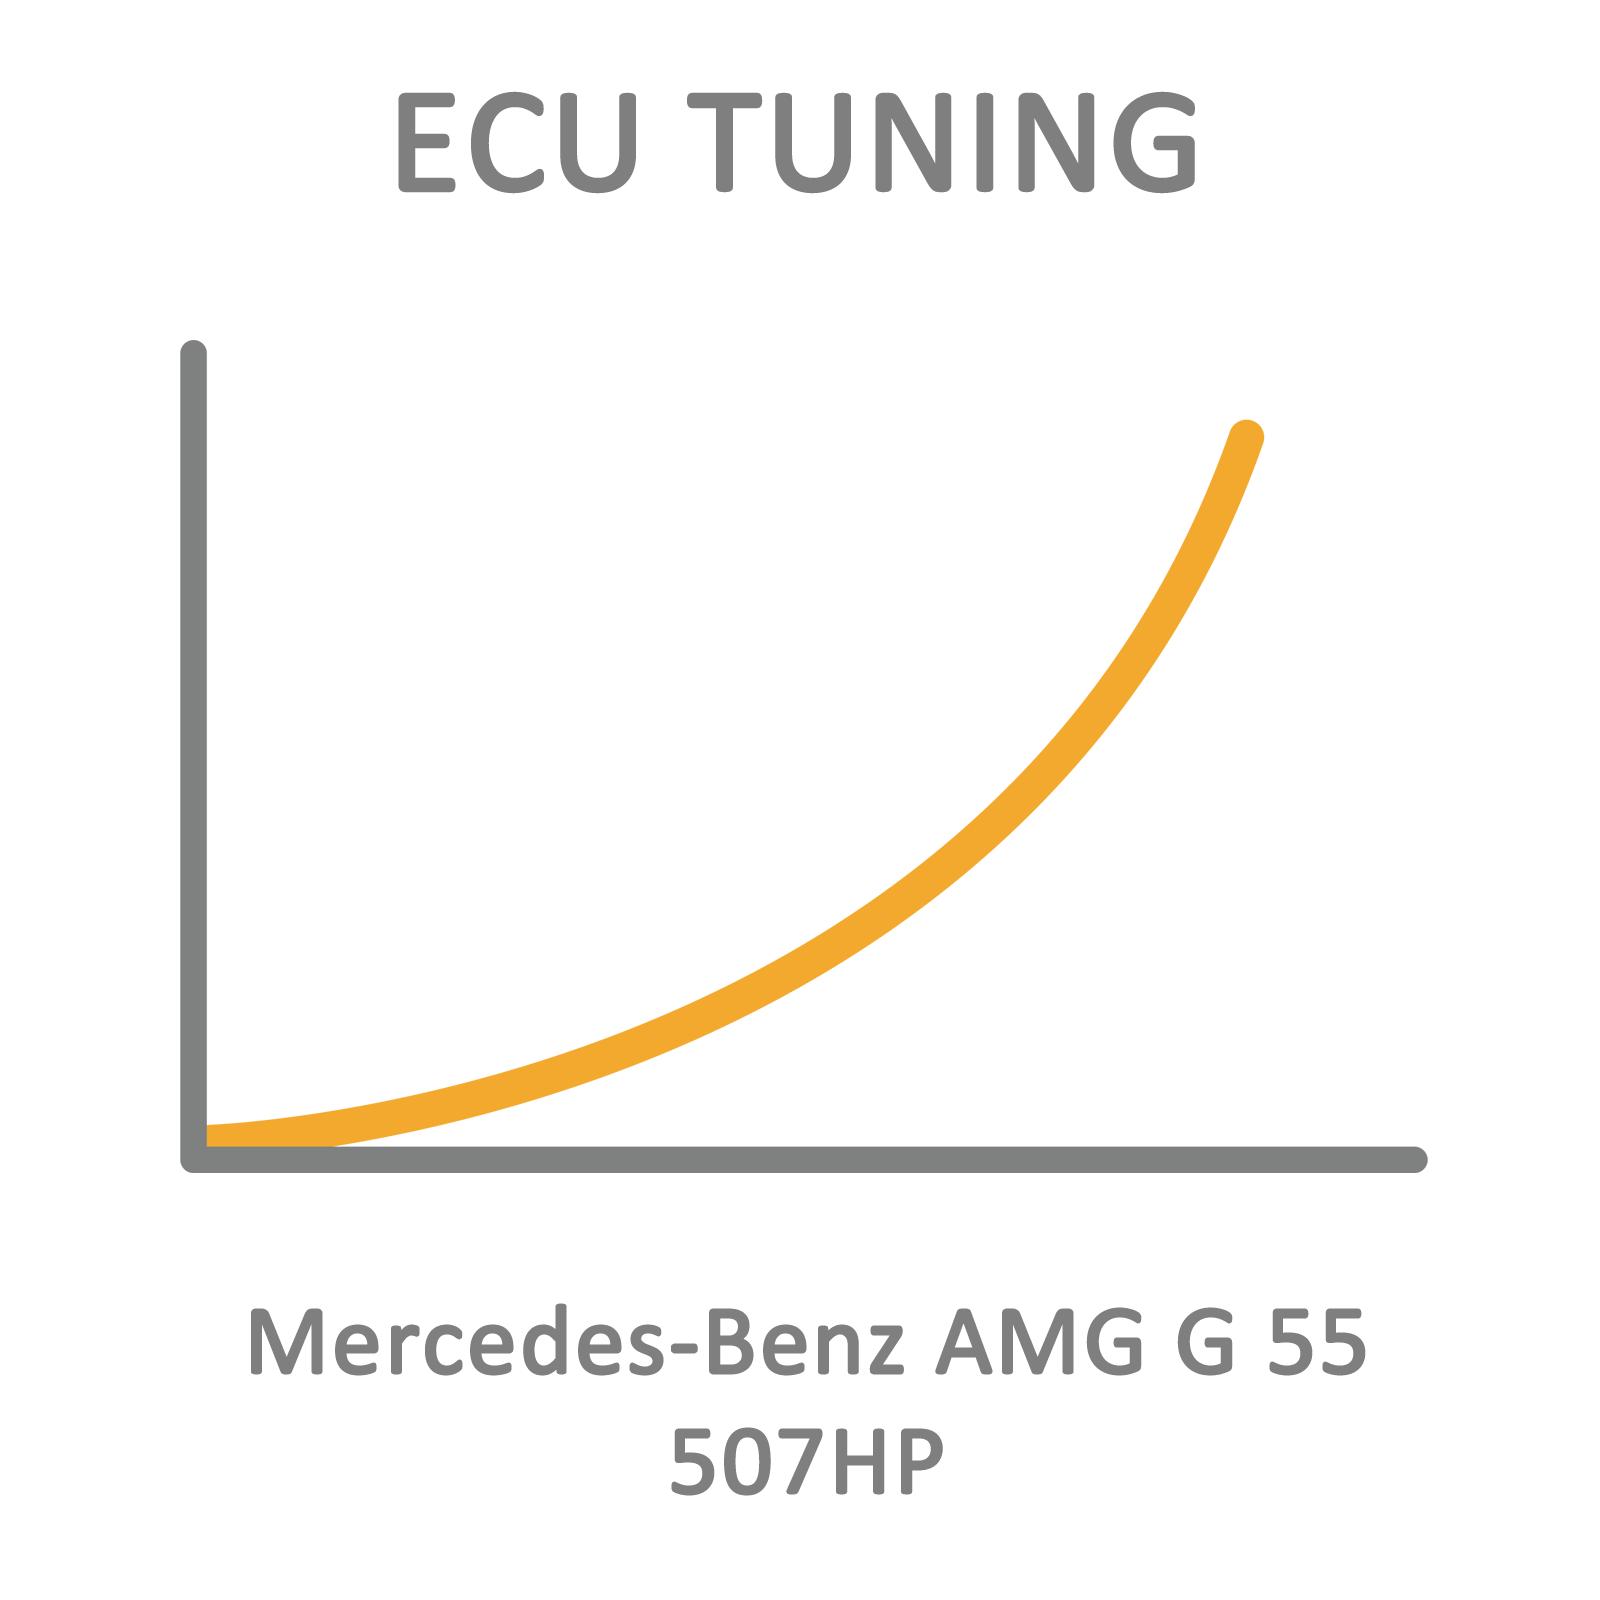 Mercedes-Benz AMG G 55 507HP ECU Tuning Remapping Programming